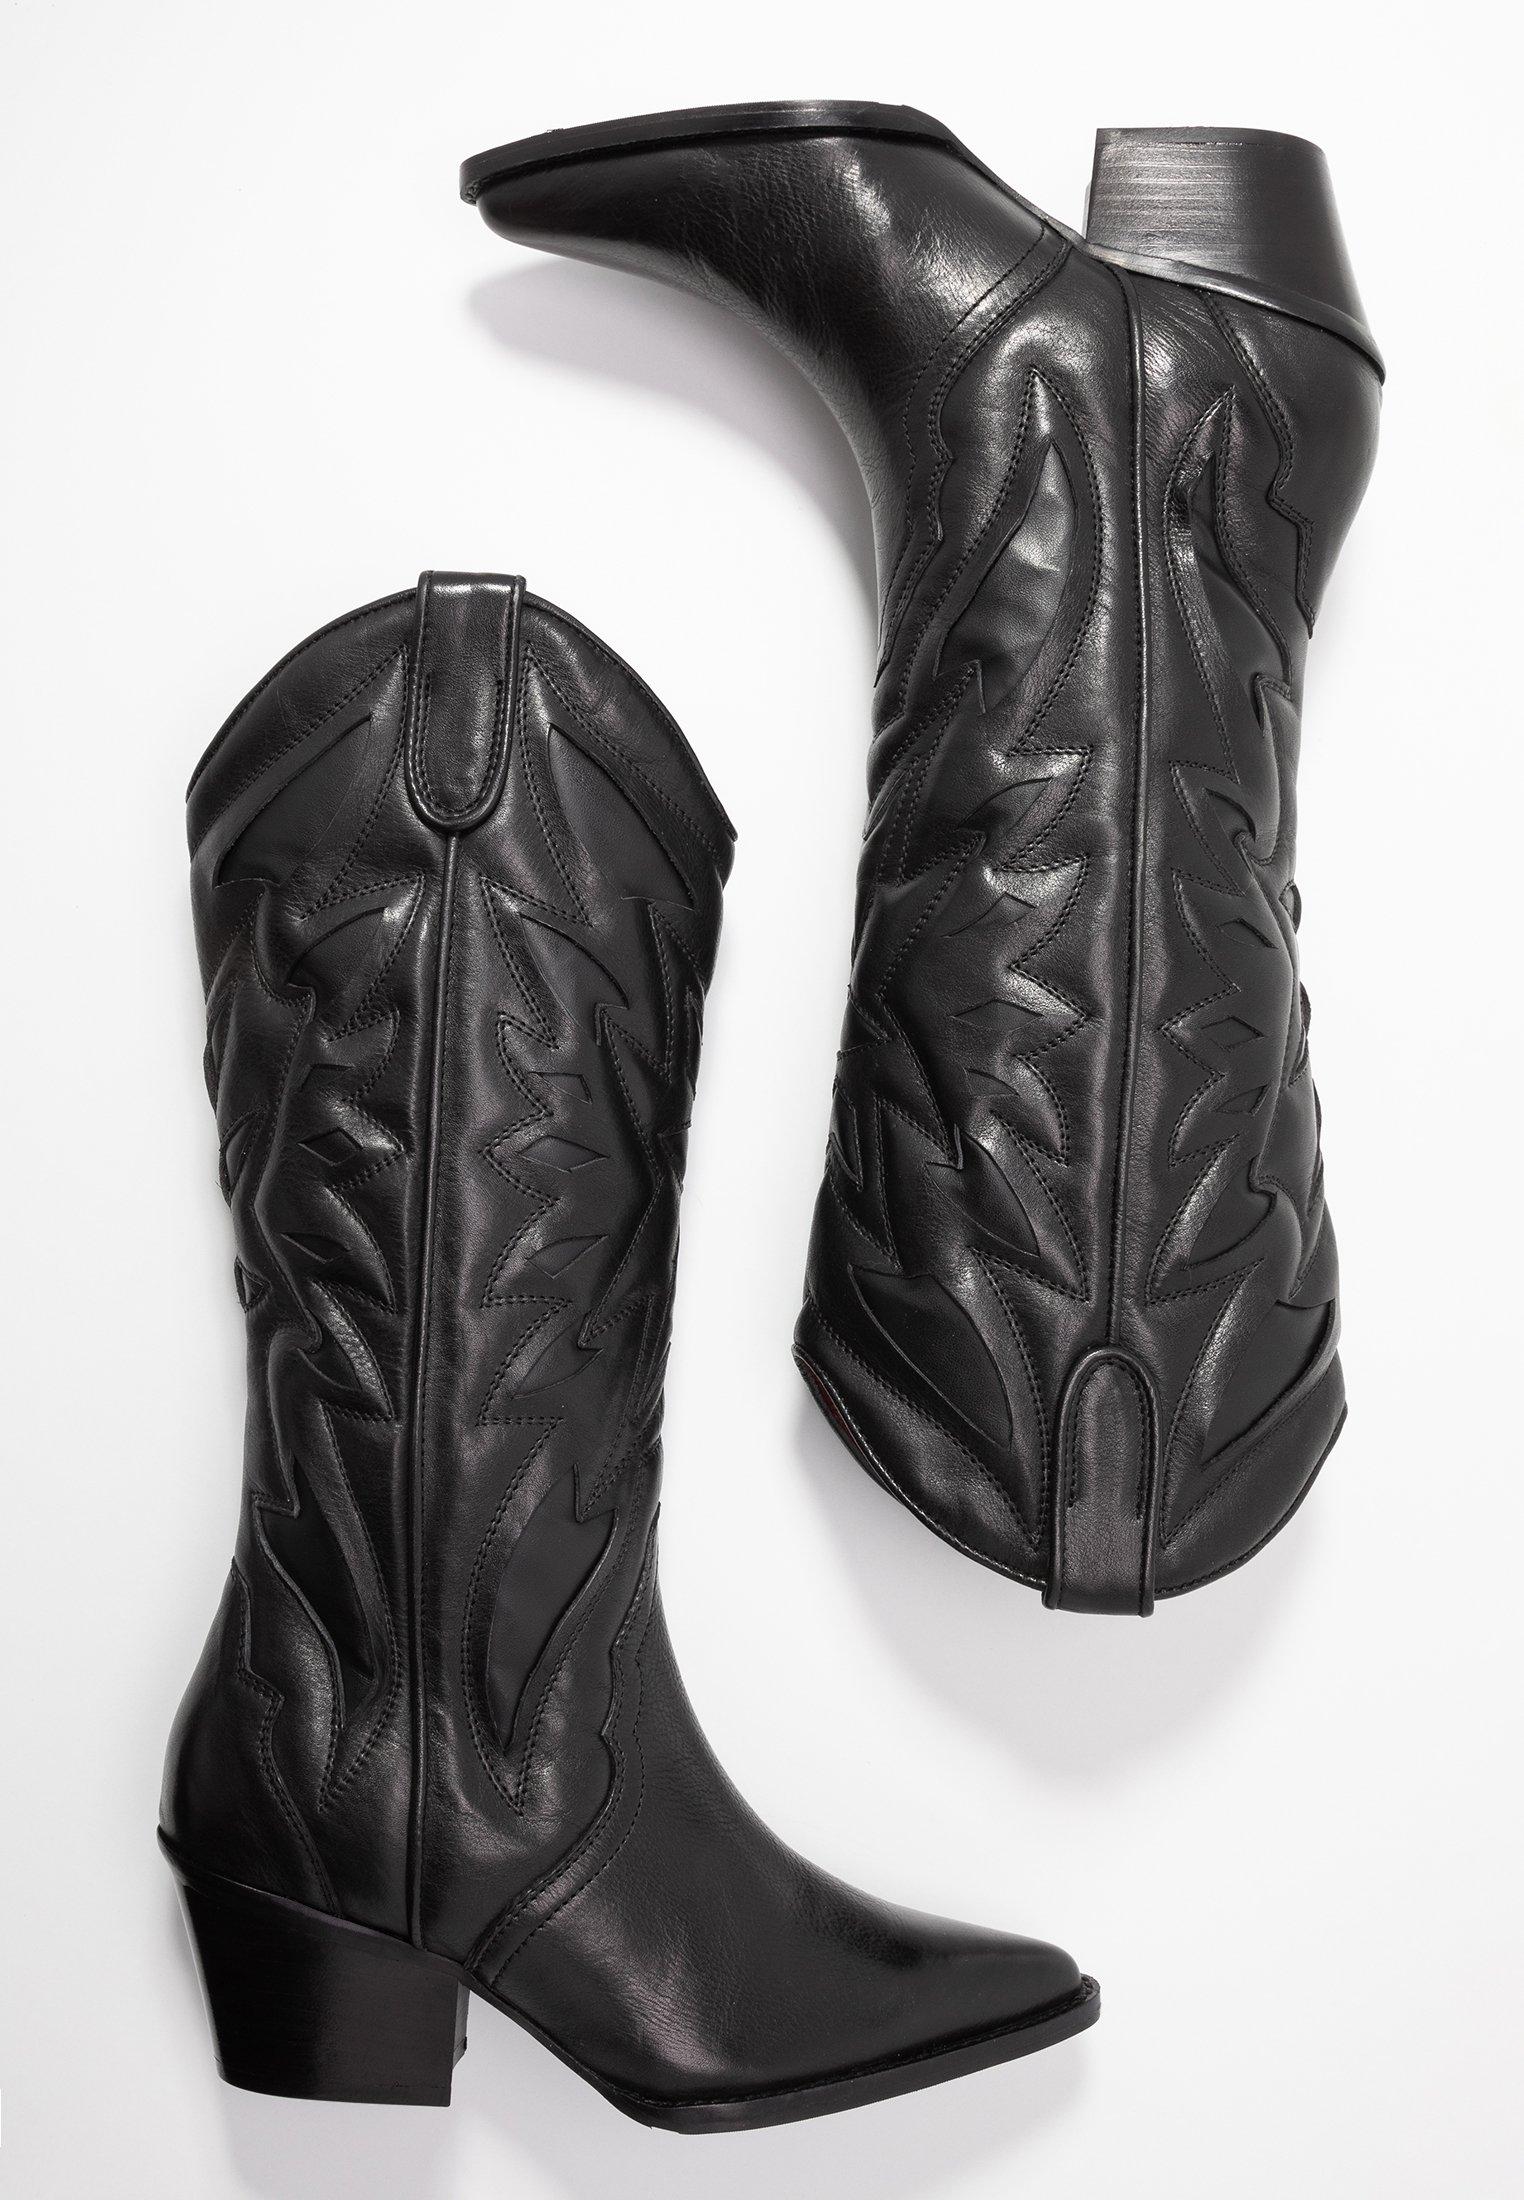 JUKESON Cowboy Bikerboots black